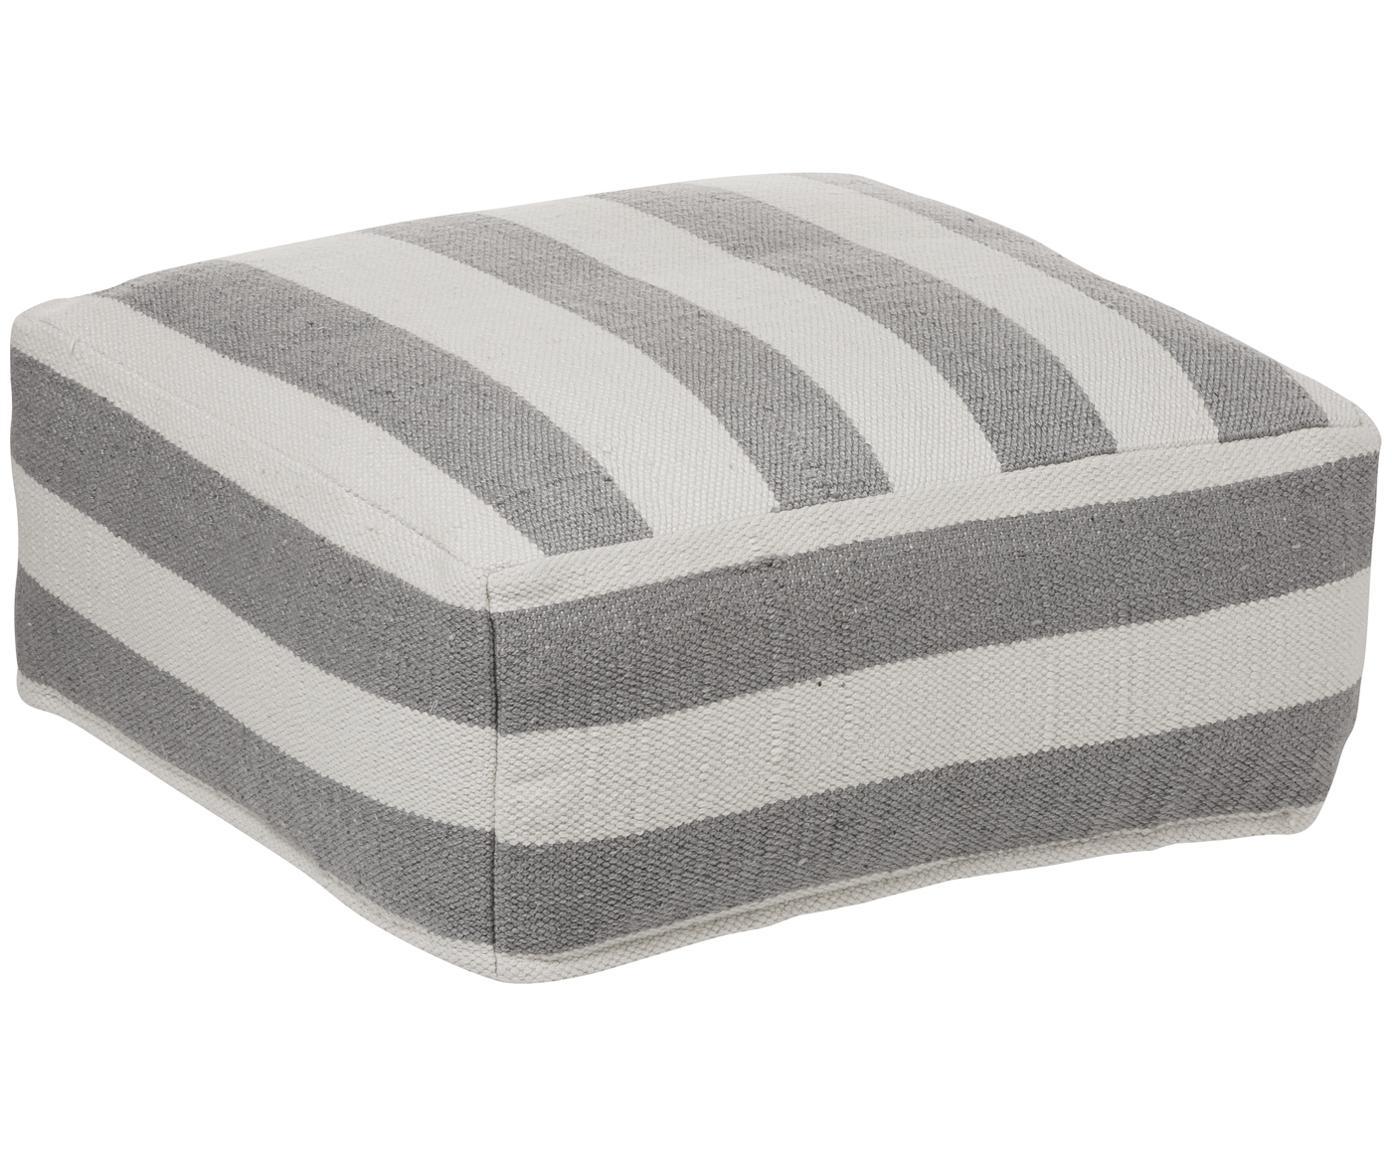 Cuscino da pavimento tessuto a mano Lani, Rivestimento: 100% poliestere, riciclat, Grigio, ecru, Larg. 63 x Alt. 30 cm